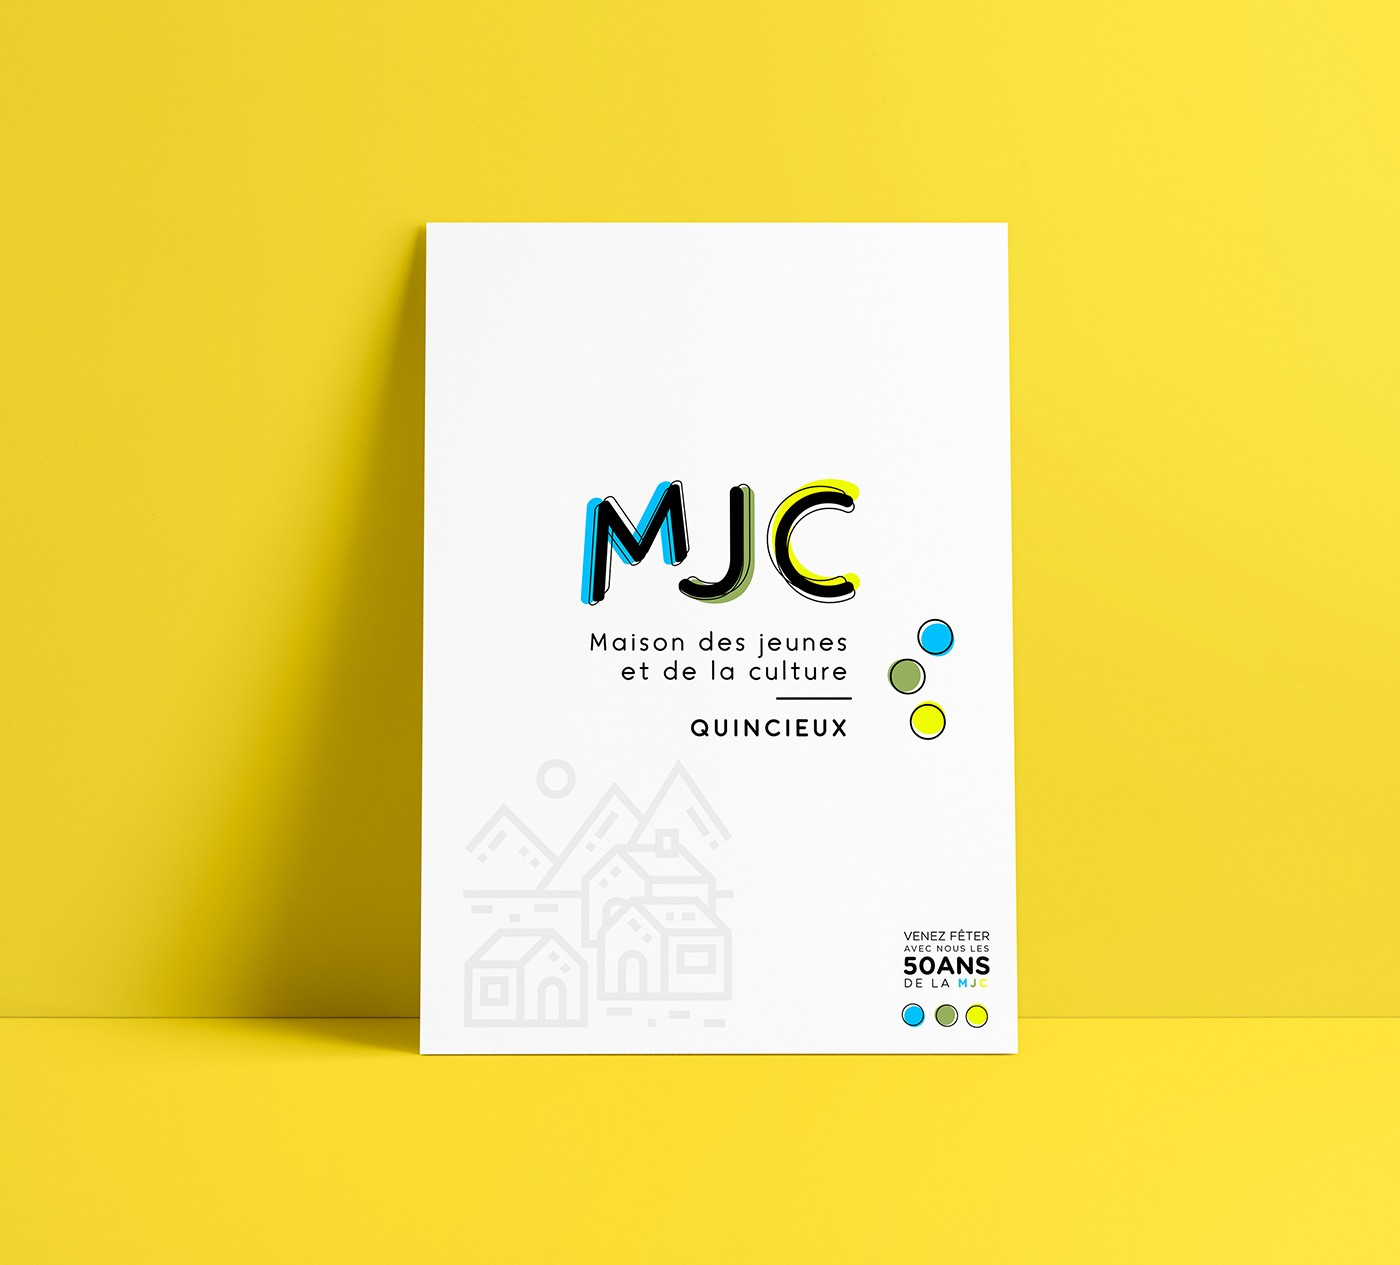 mjc-quincieux-poster-refonte-logo